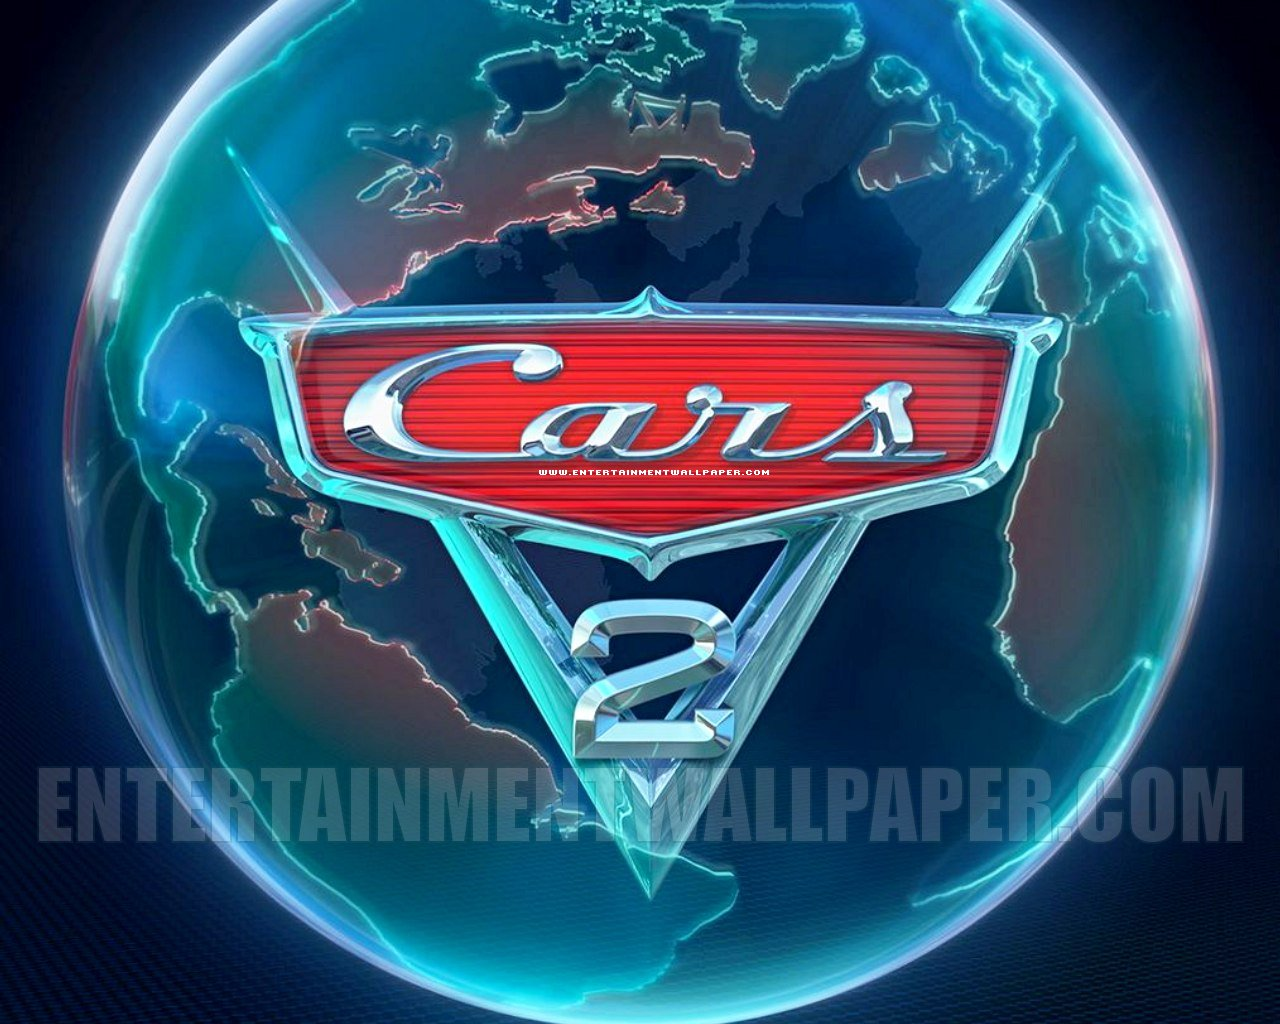 Cars 2 movie trailer download cars 2 wallpapers disney - Disney cars 3 wallpaper ...